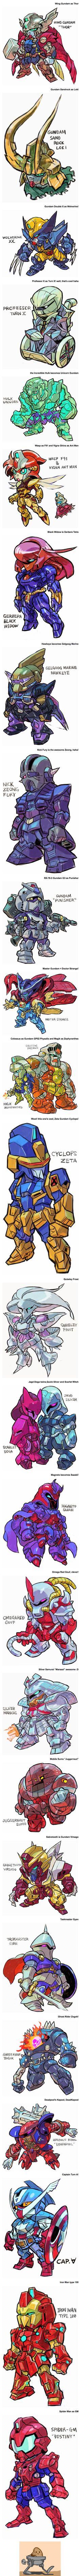 What if Gundam turns into Marvel Superheroes